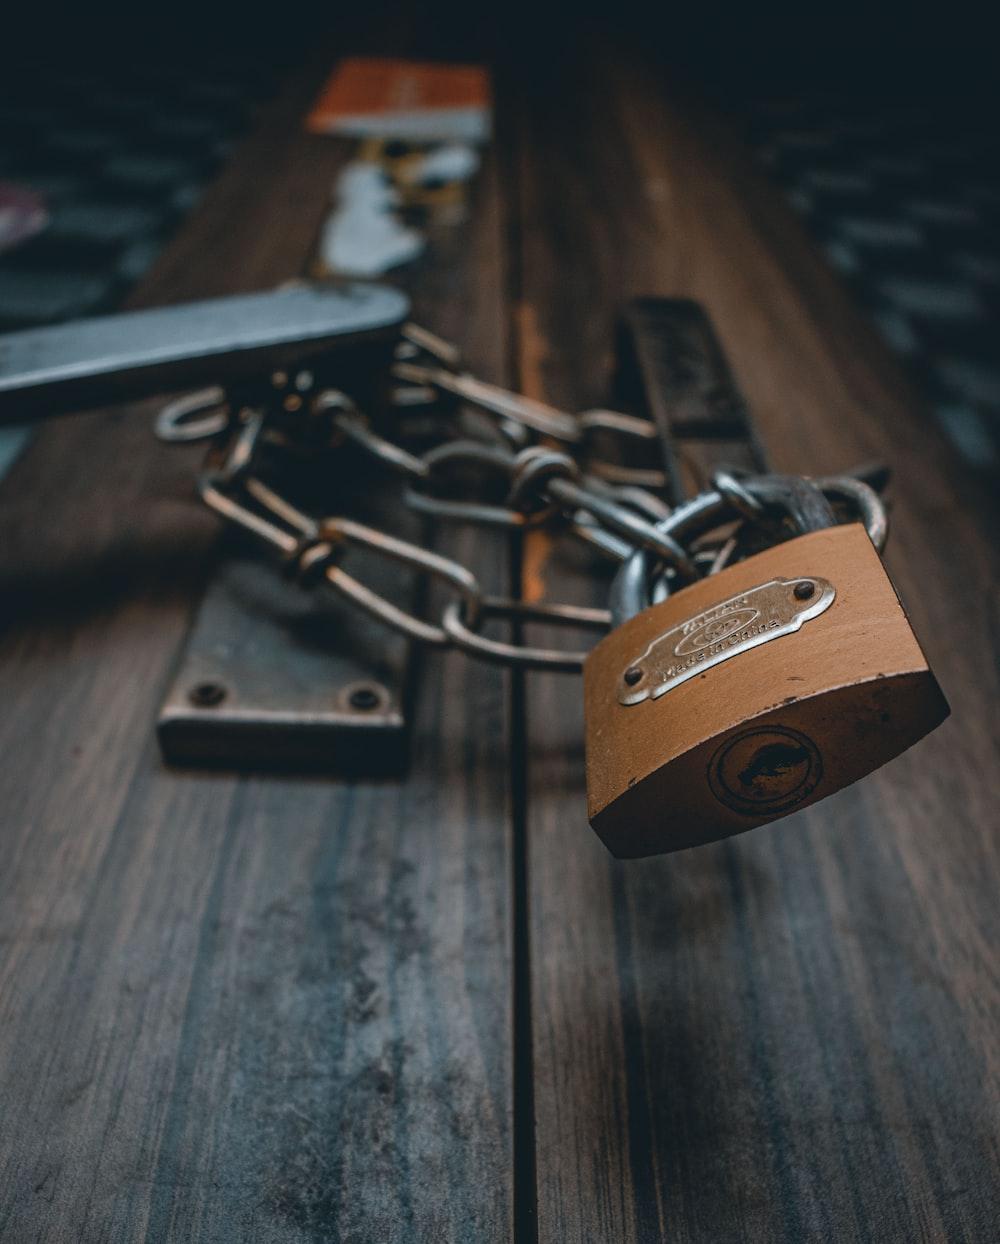 brown padlock on brown wooden surface